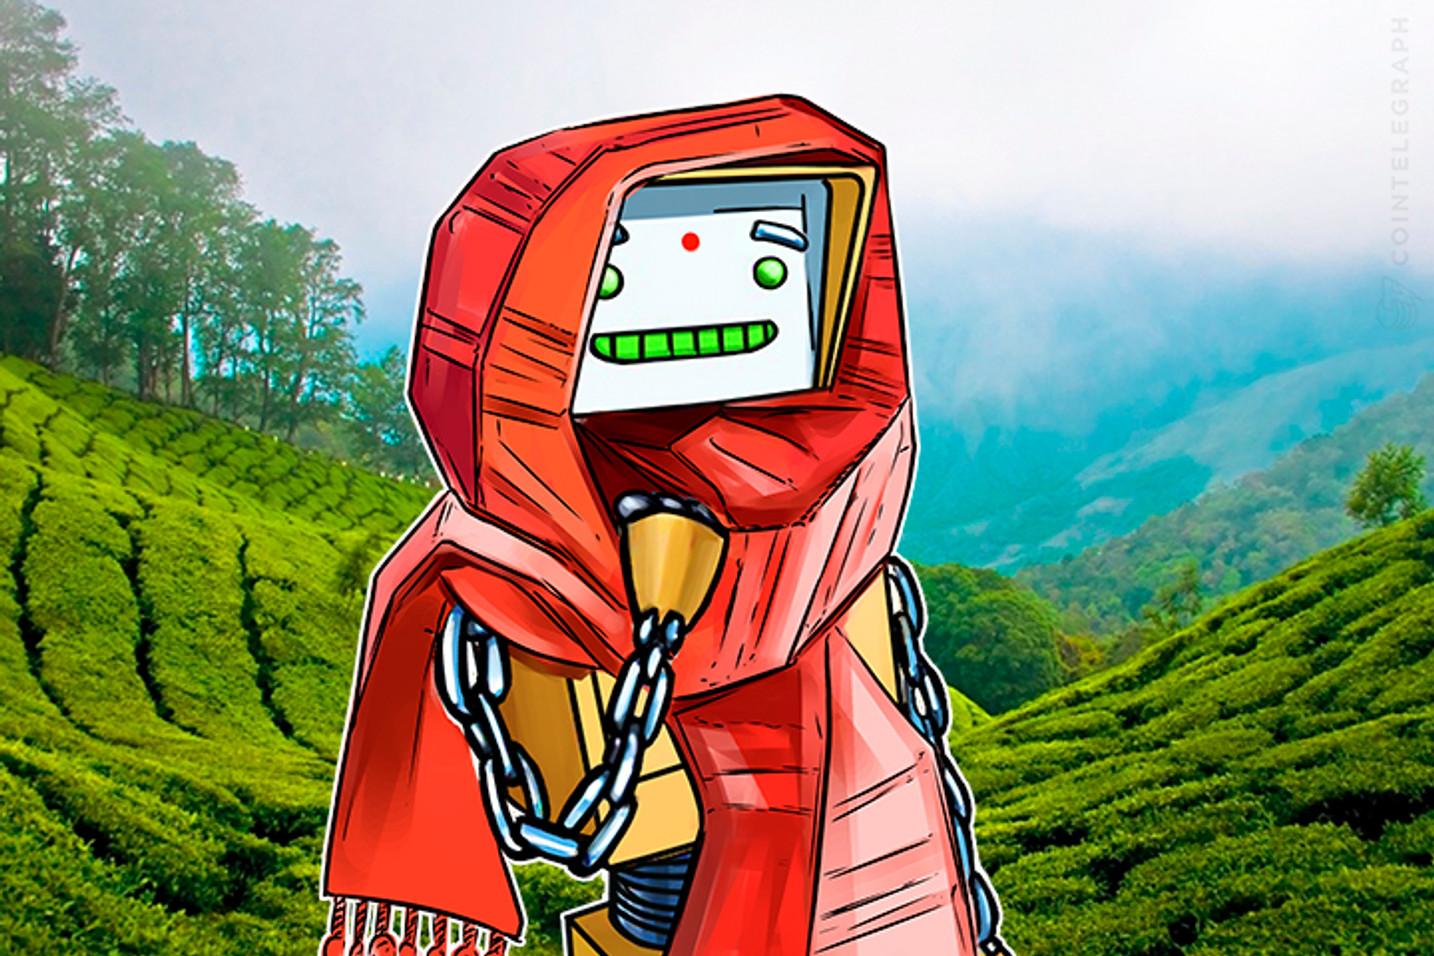 Crescente apetite por Blockchain na Índia